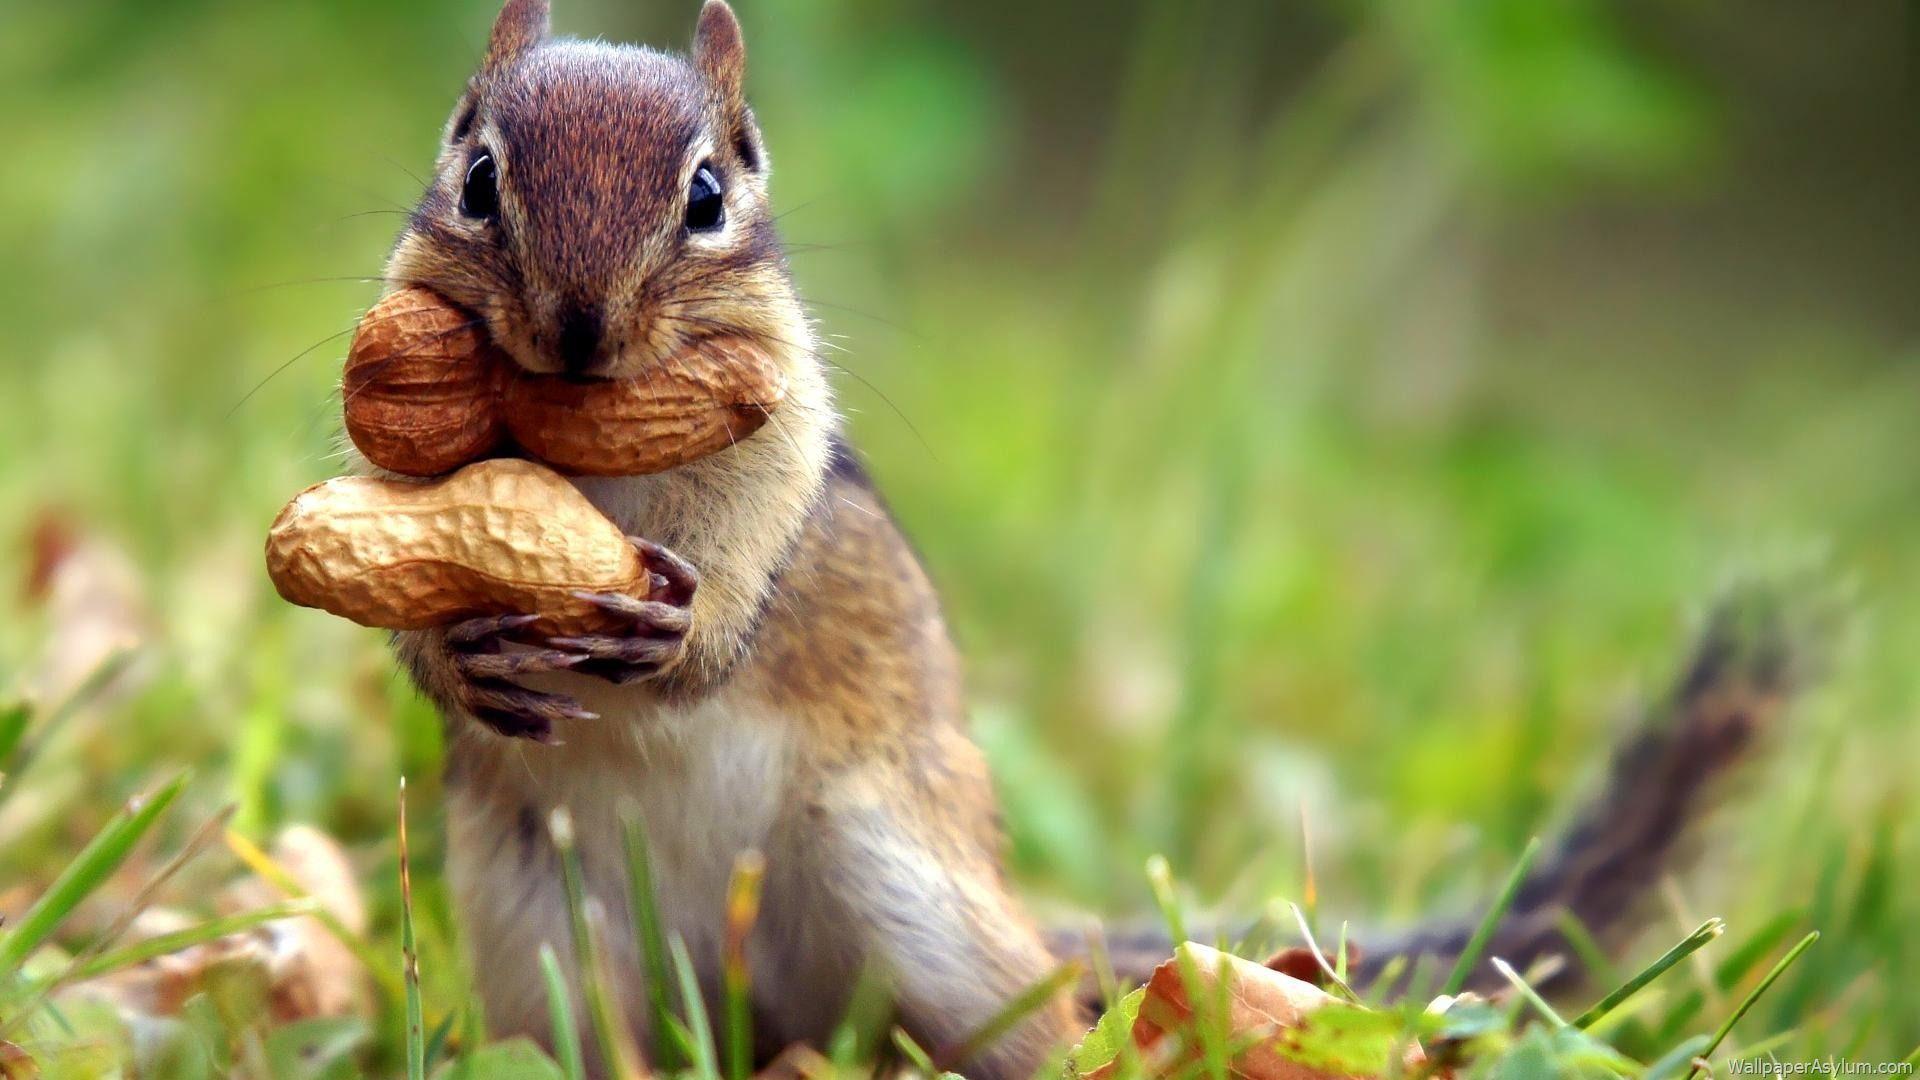 Squirrel Wallpapers Wallpaper